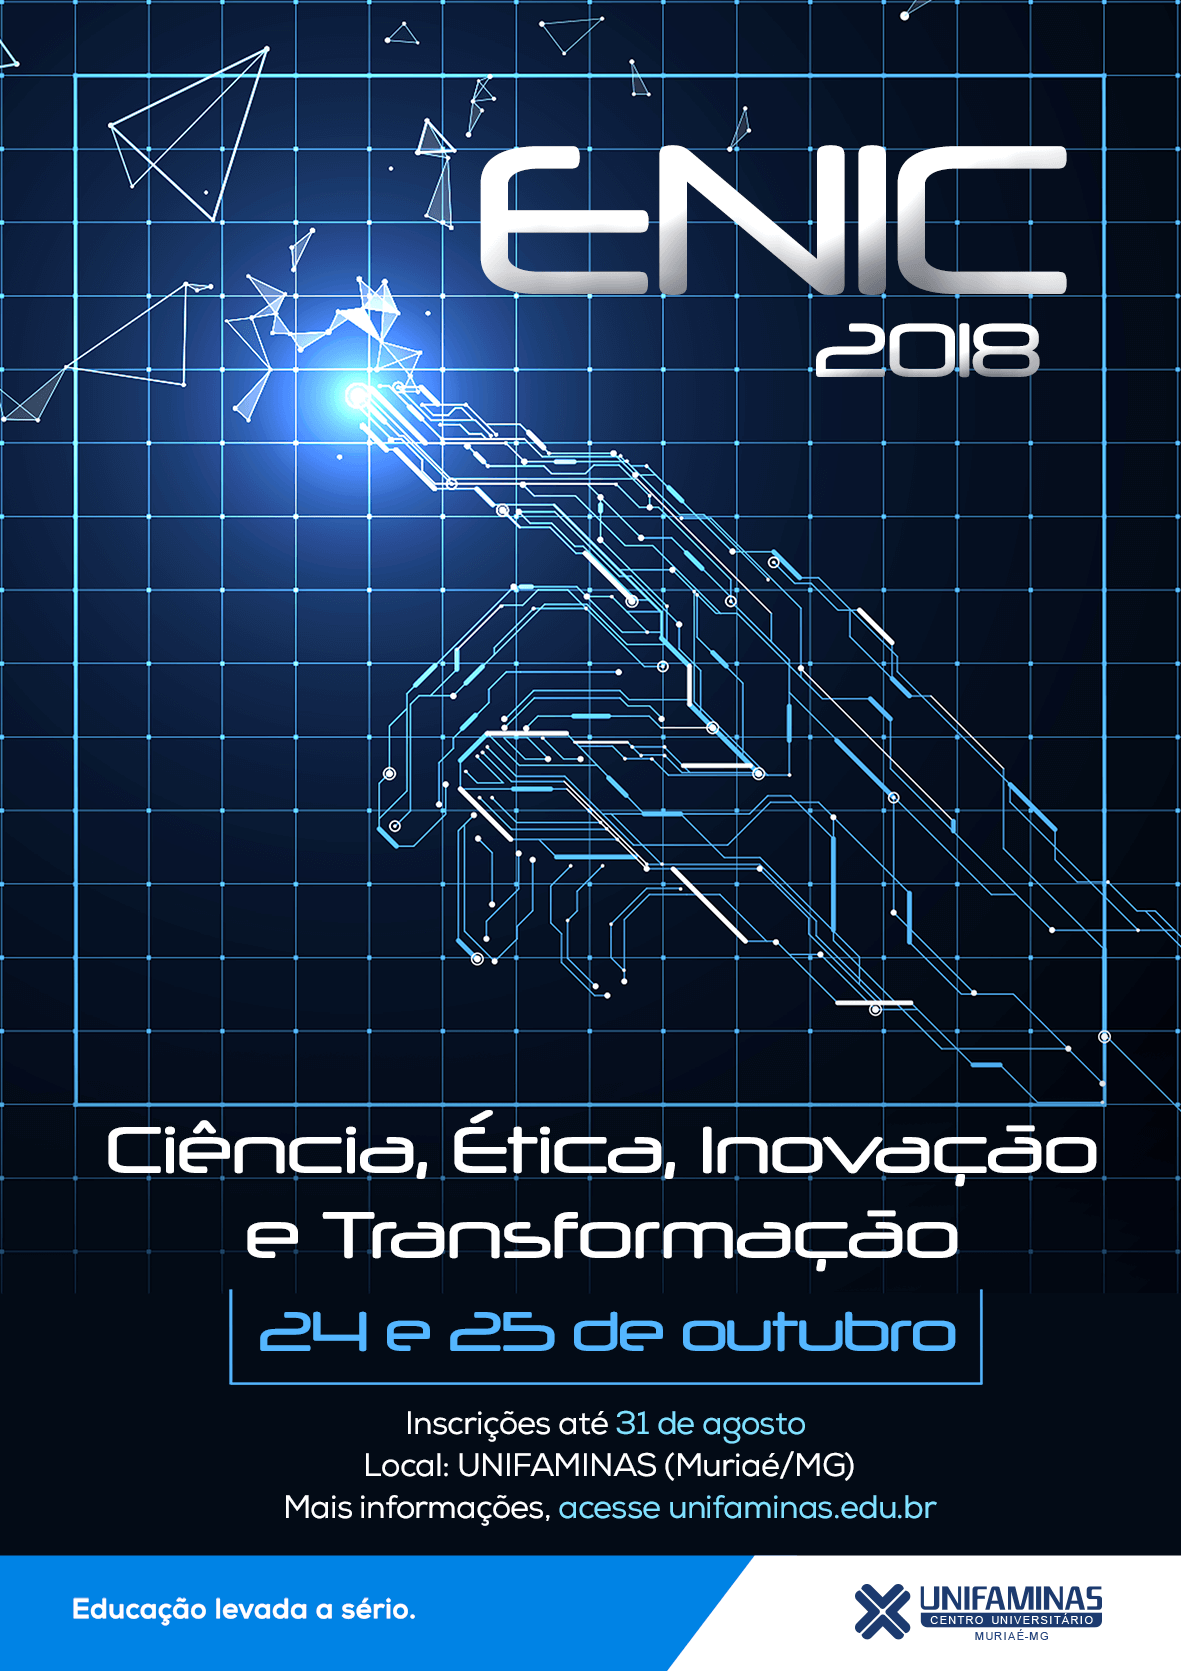 UNIFAMINAS – Enic 2018